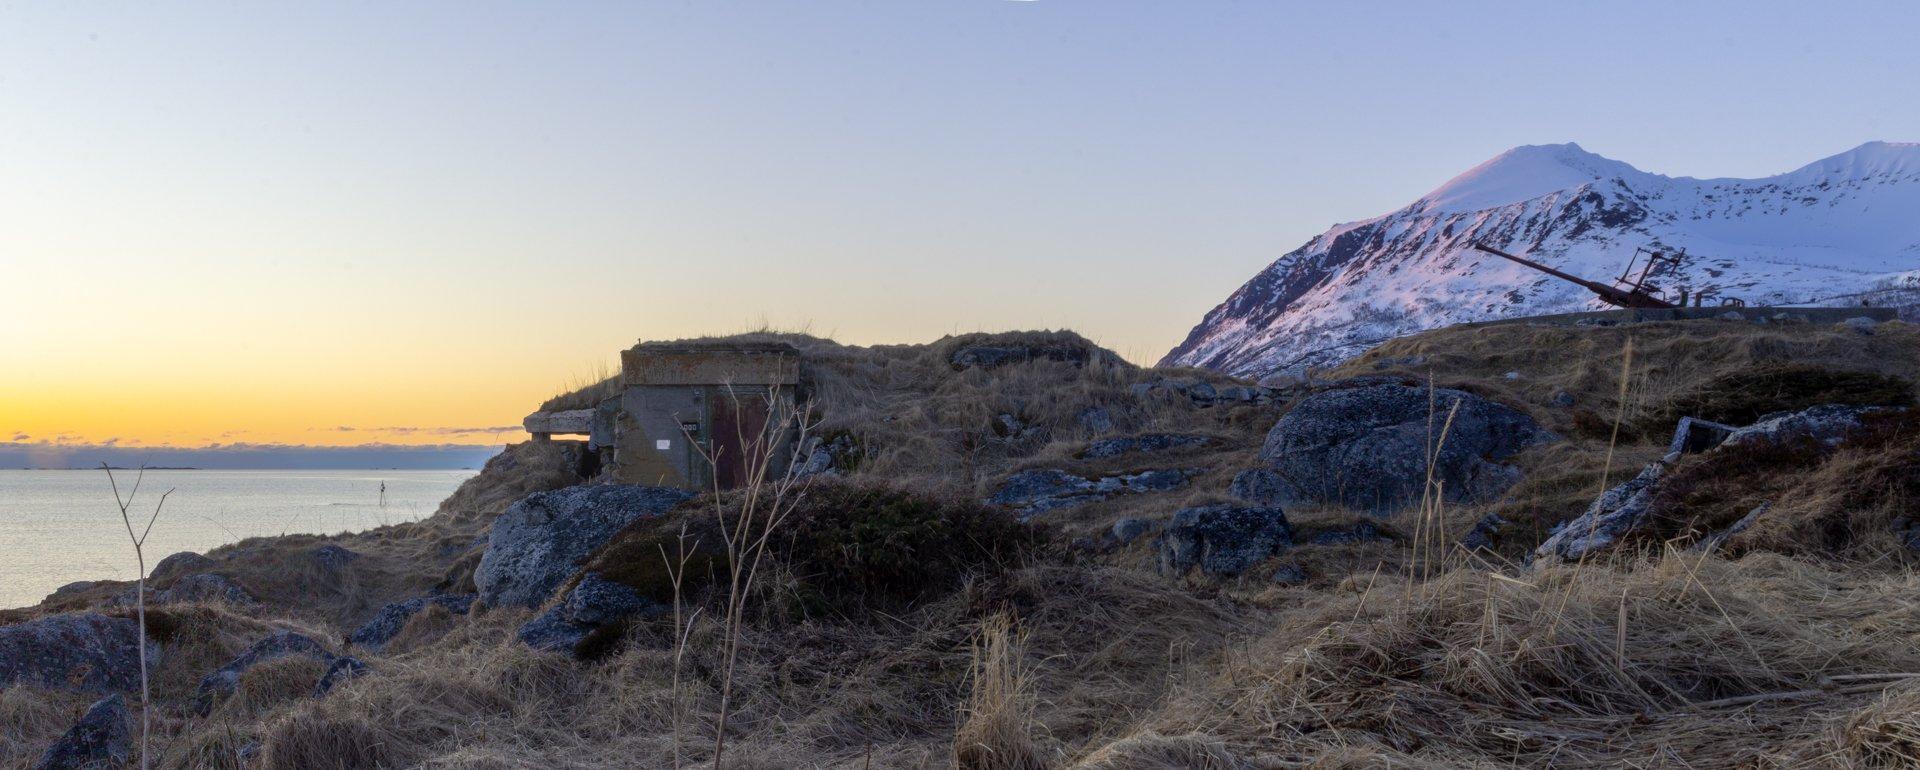 Skrolsvik Fort